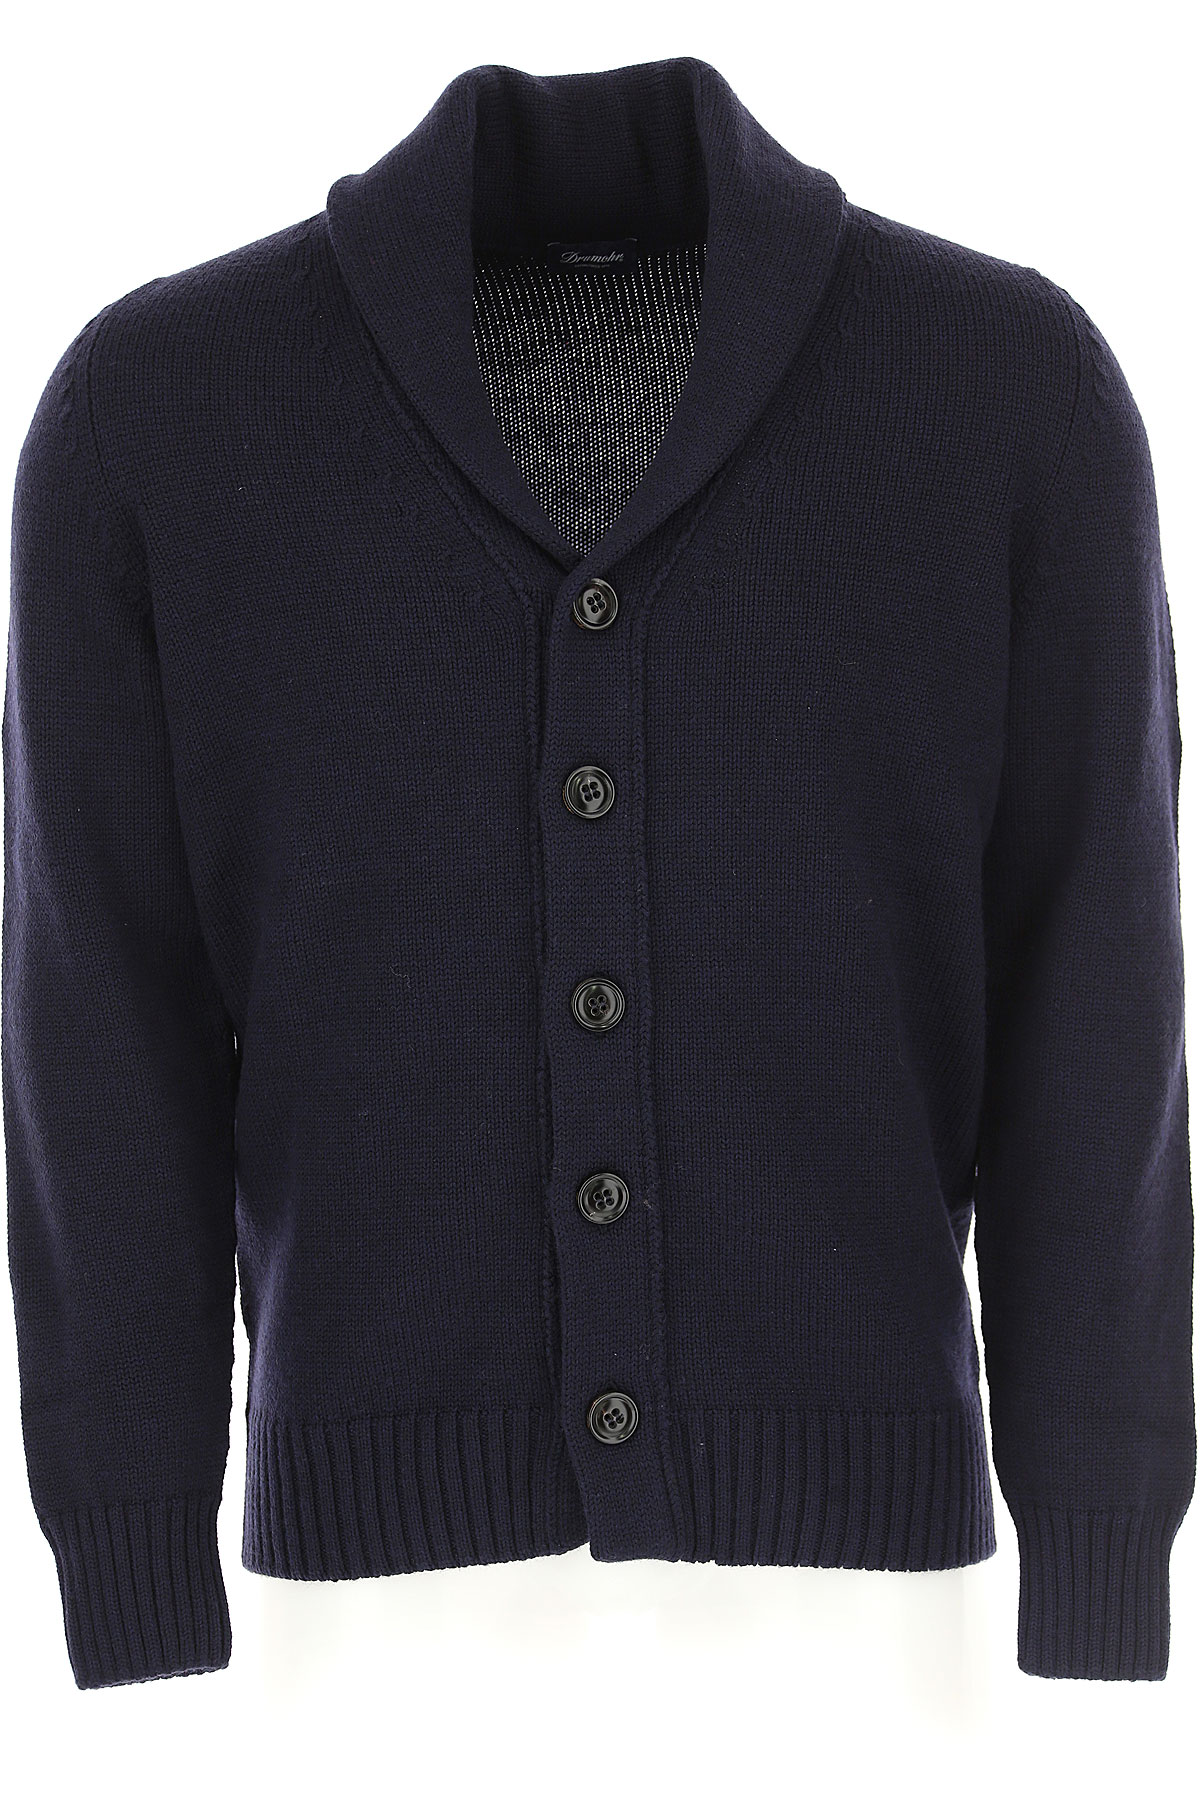 Image of Drumohr Sweater for Men Jumper, Dark Blue, merino wool, 2017, L M S XL